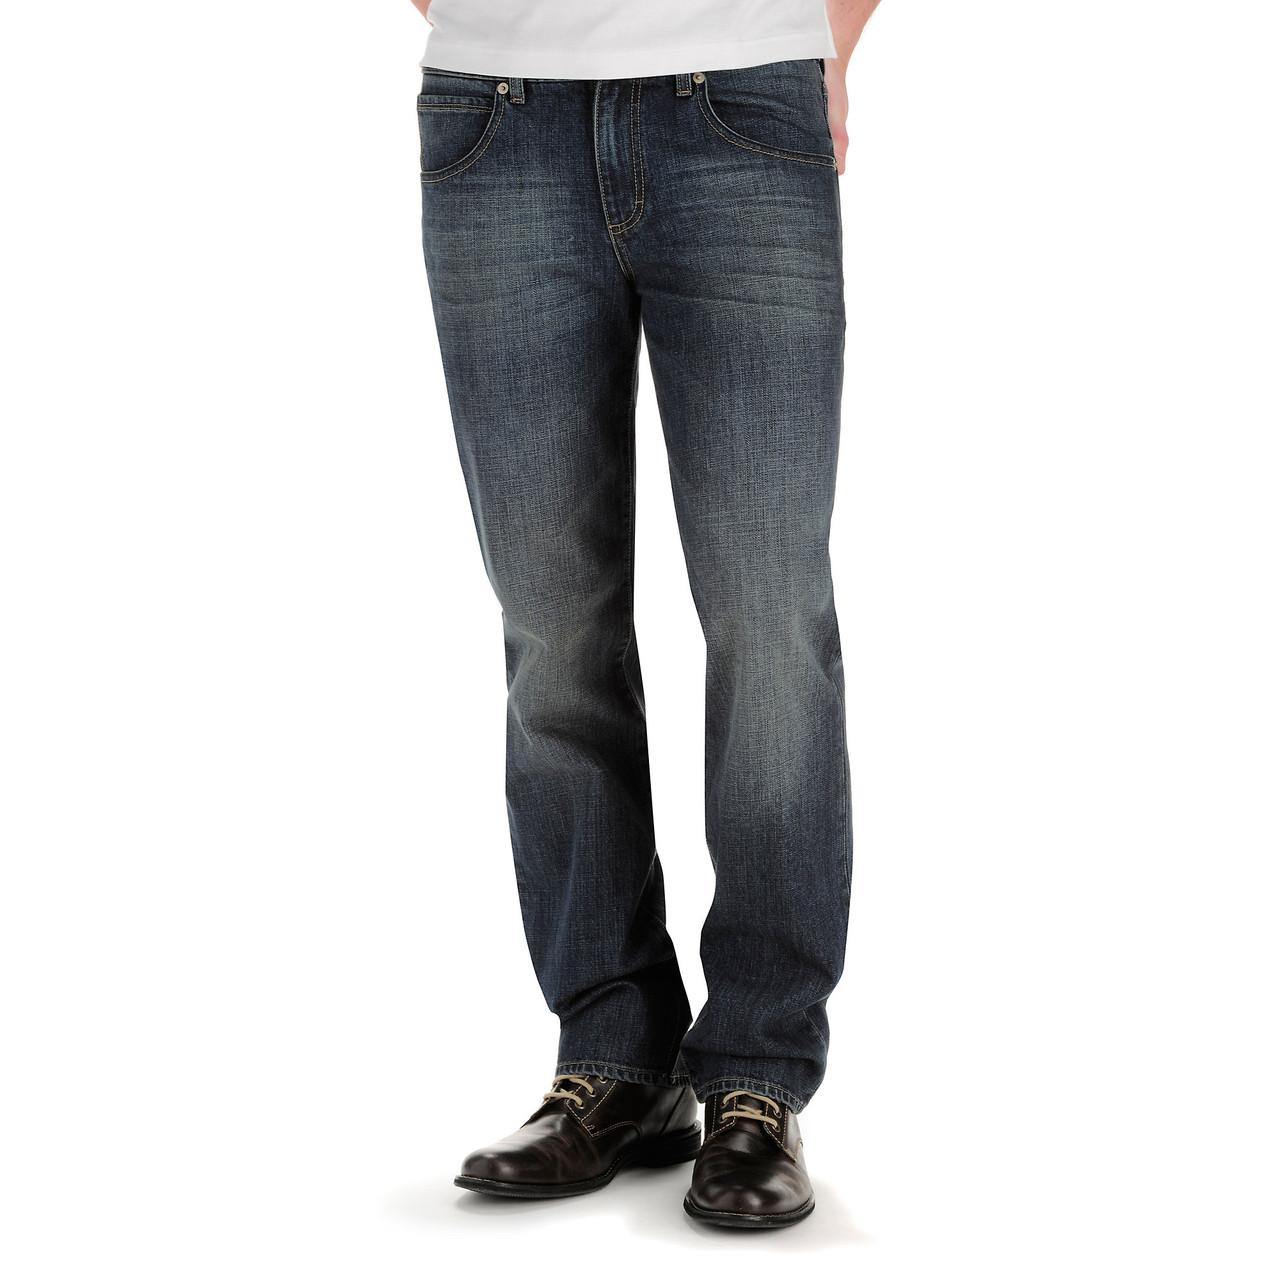 Джинсы Lee Modern Series Straight Fit Straight Leg, Blue Devil, 36W34L, 2013621